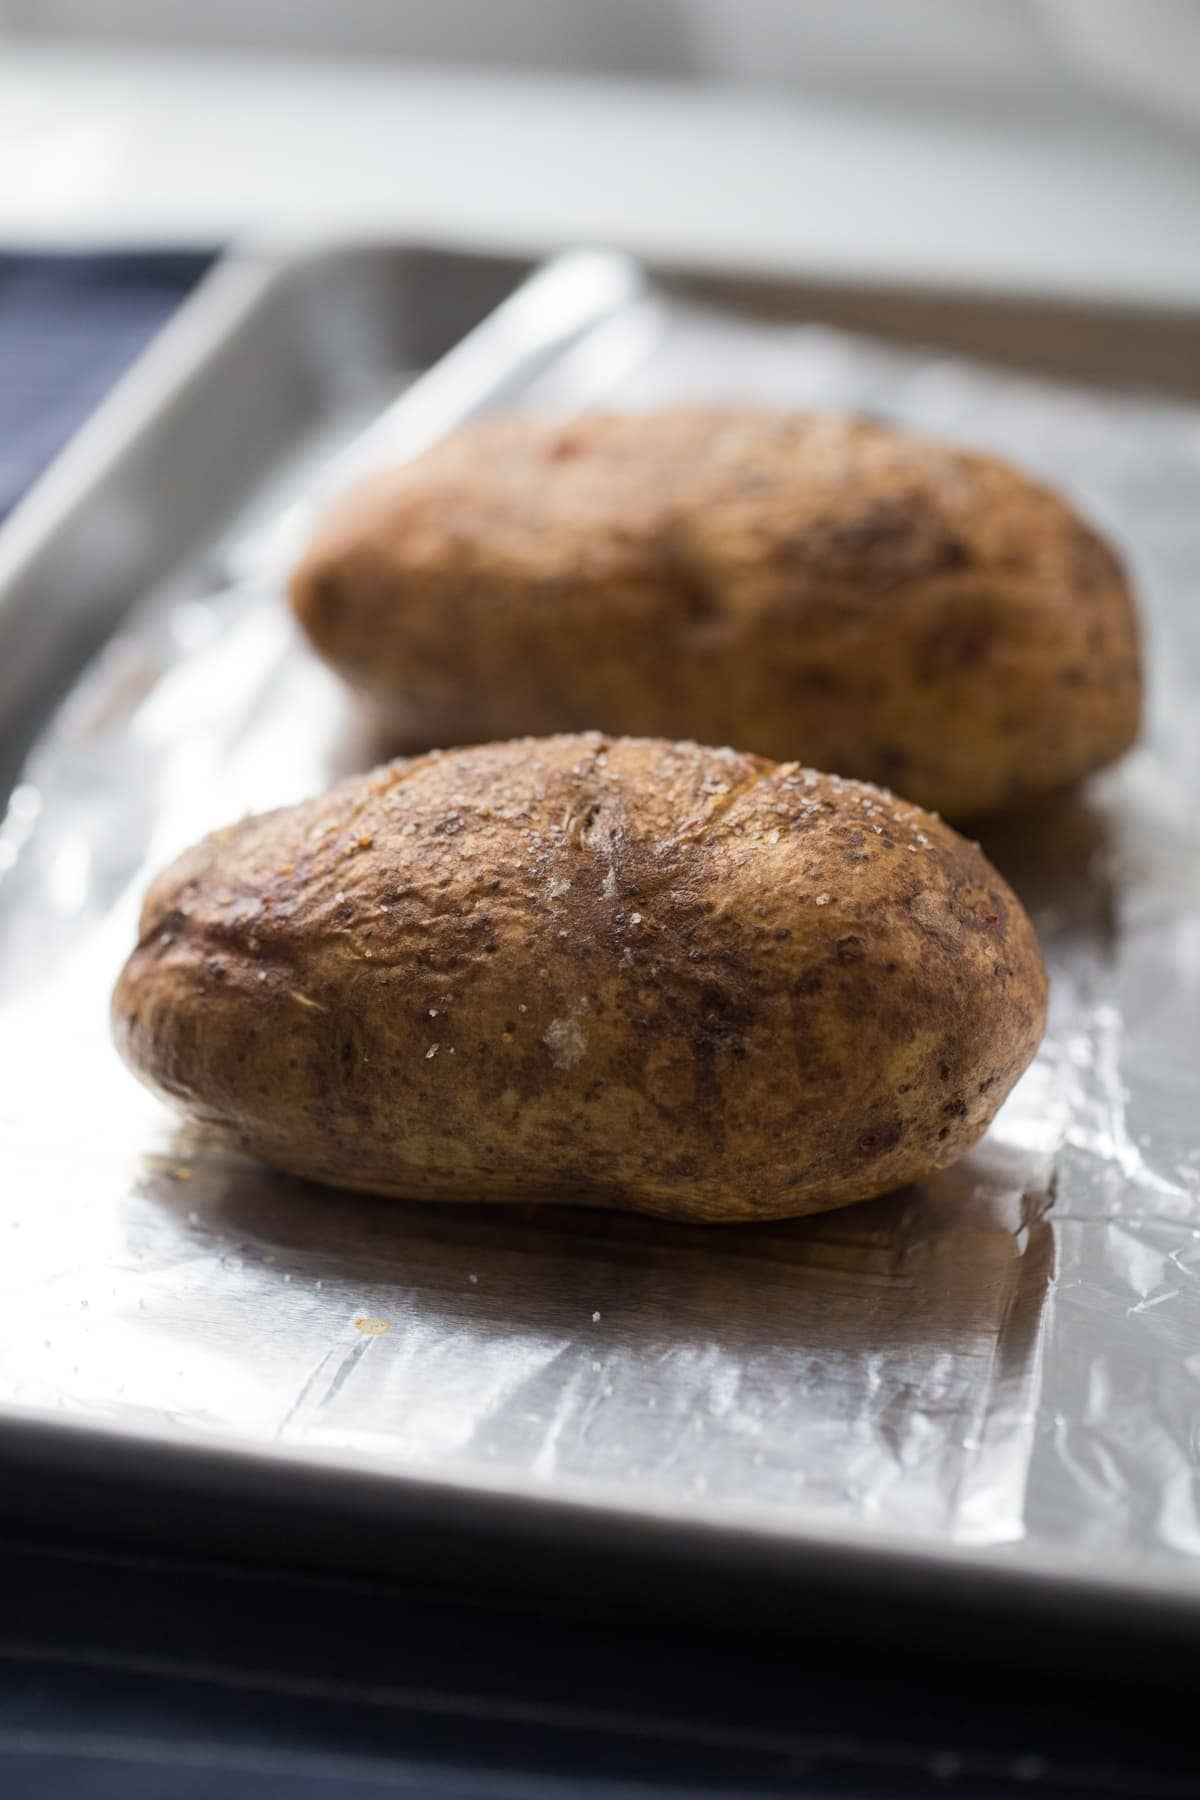 crispy skin baked potato